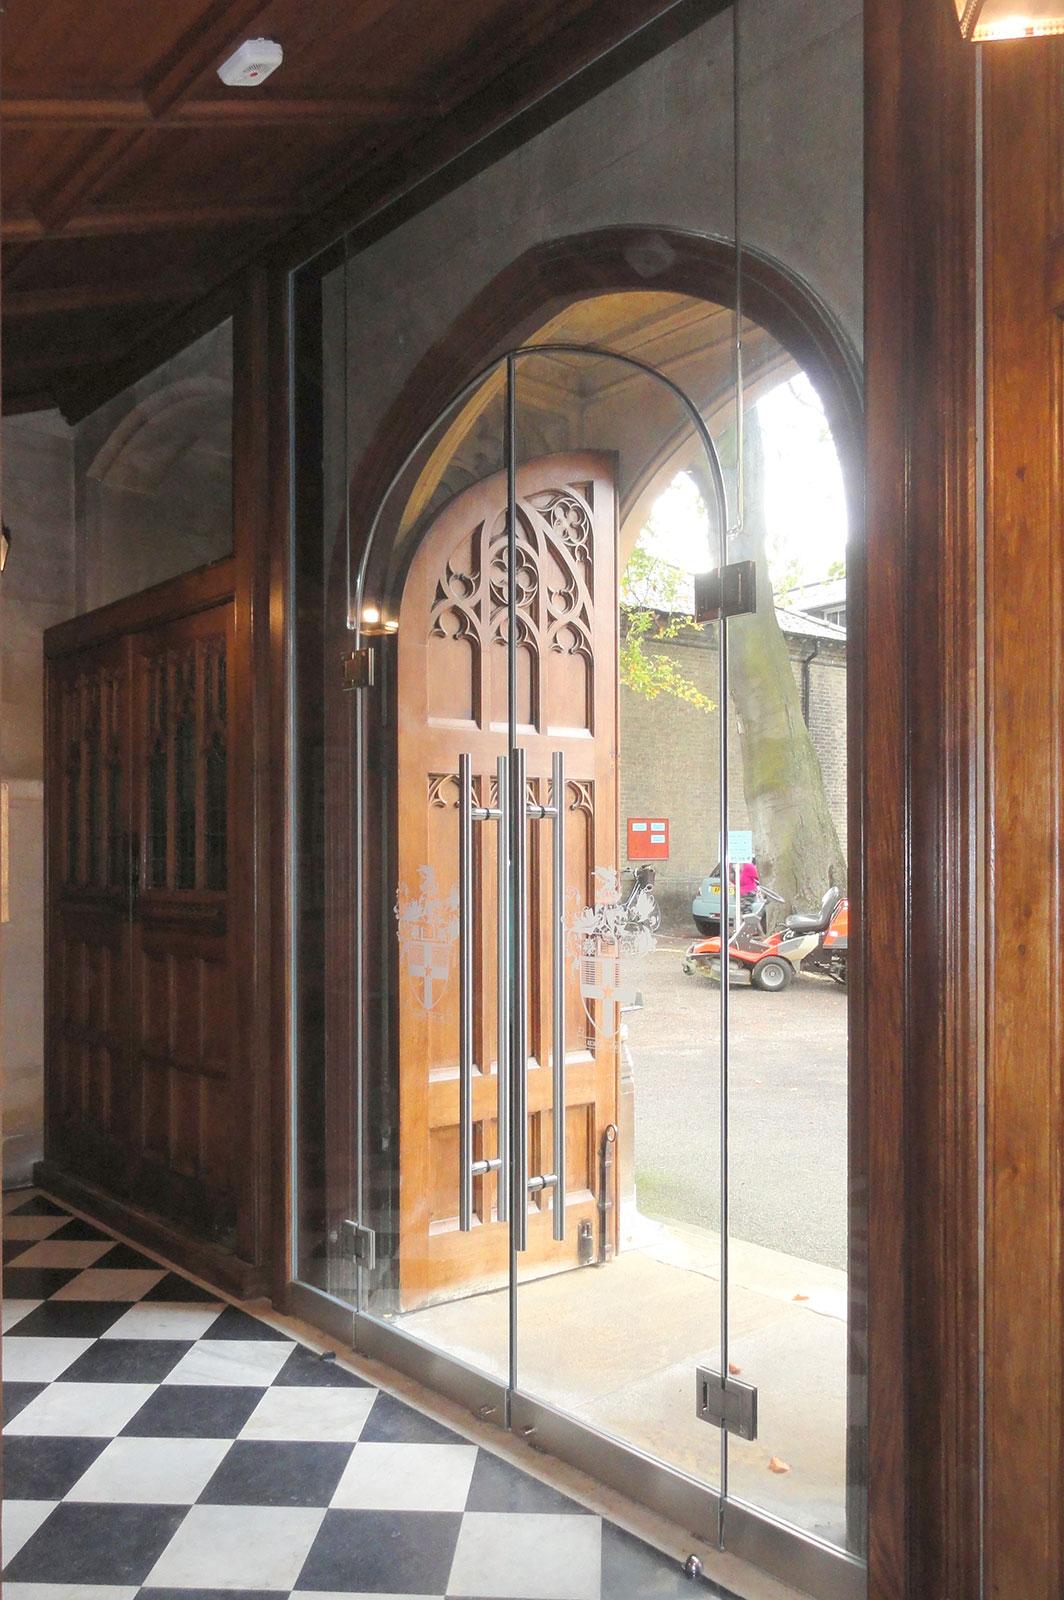 The Leys School Frameless Arch Glass Doors Case Study